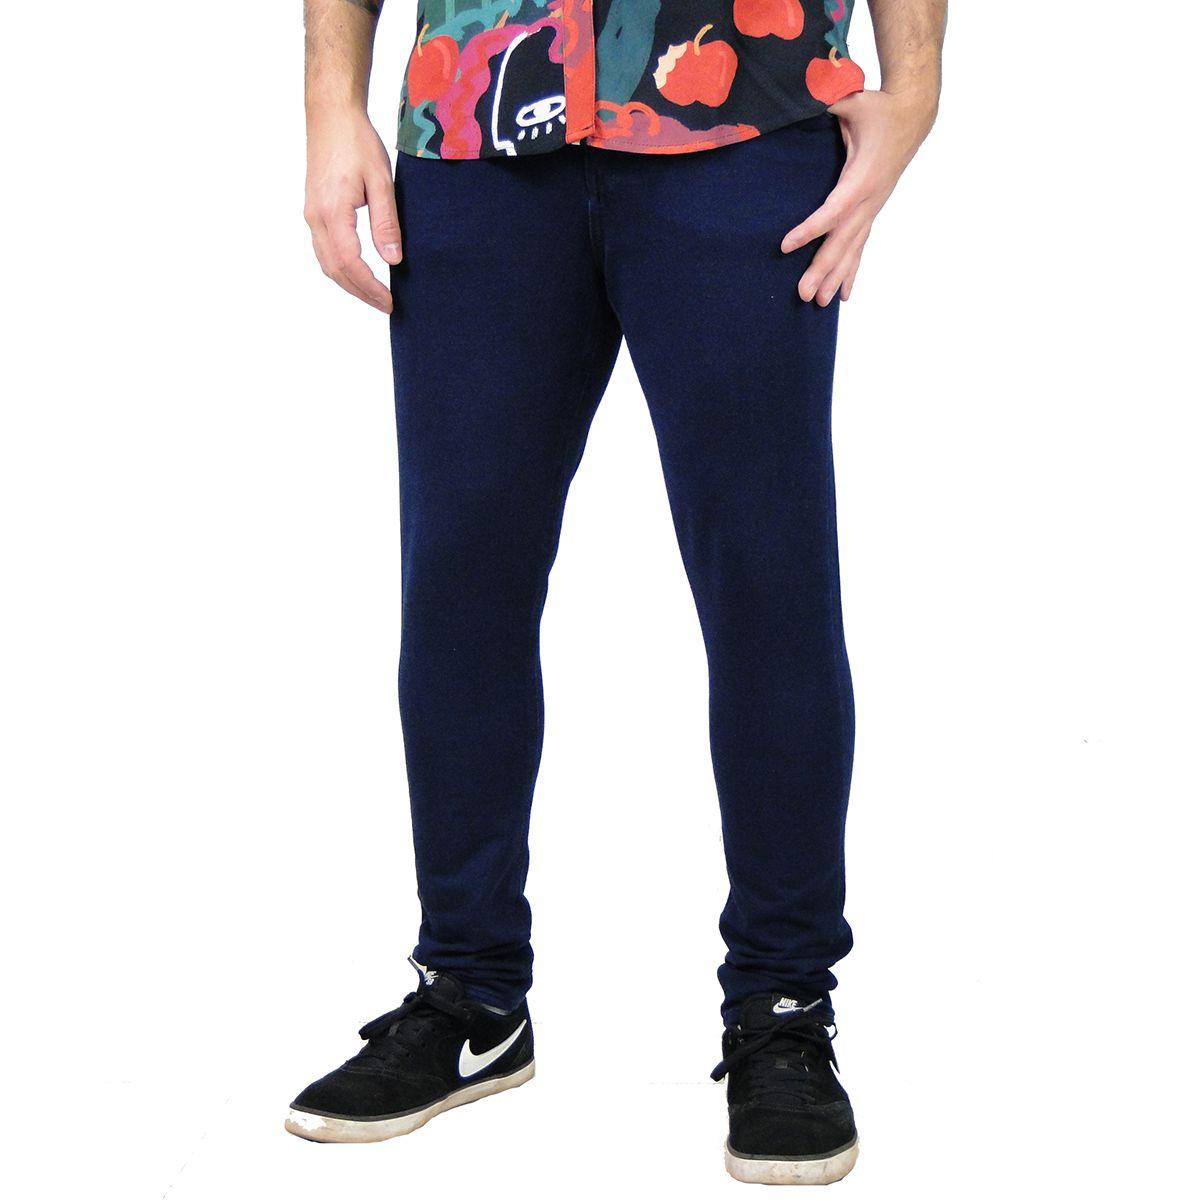 Calça Yonders Masculina Jeans Azul